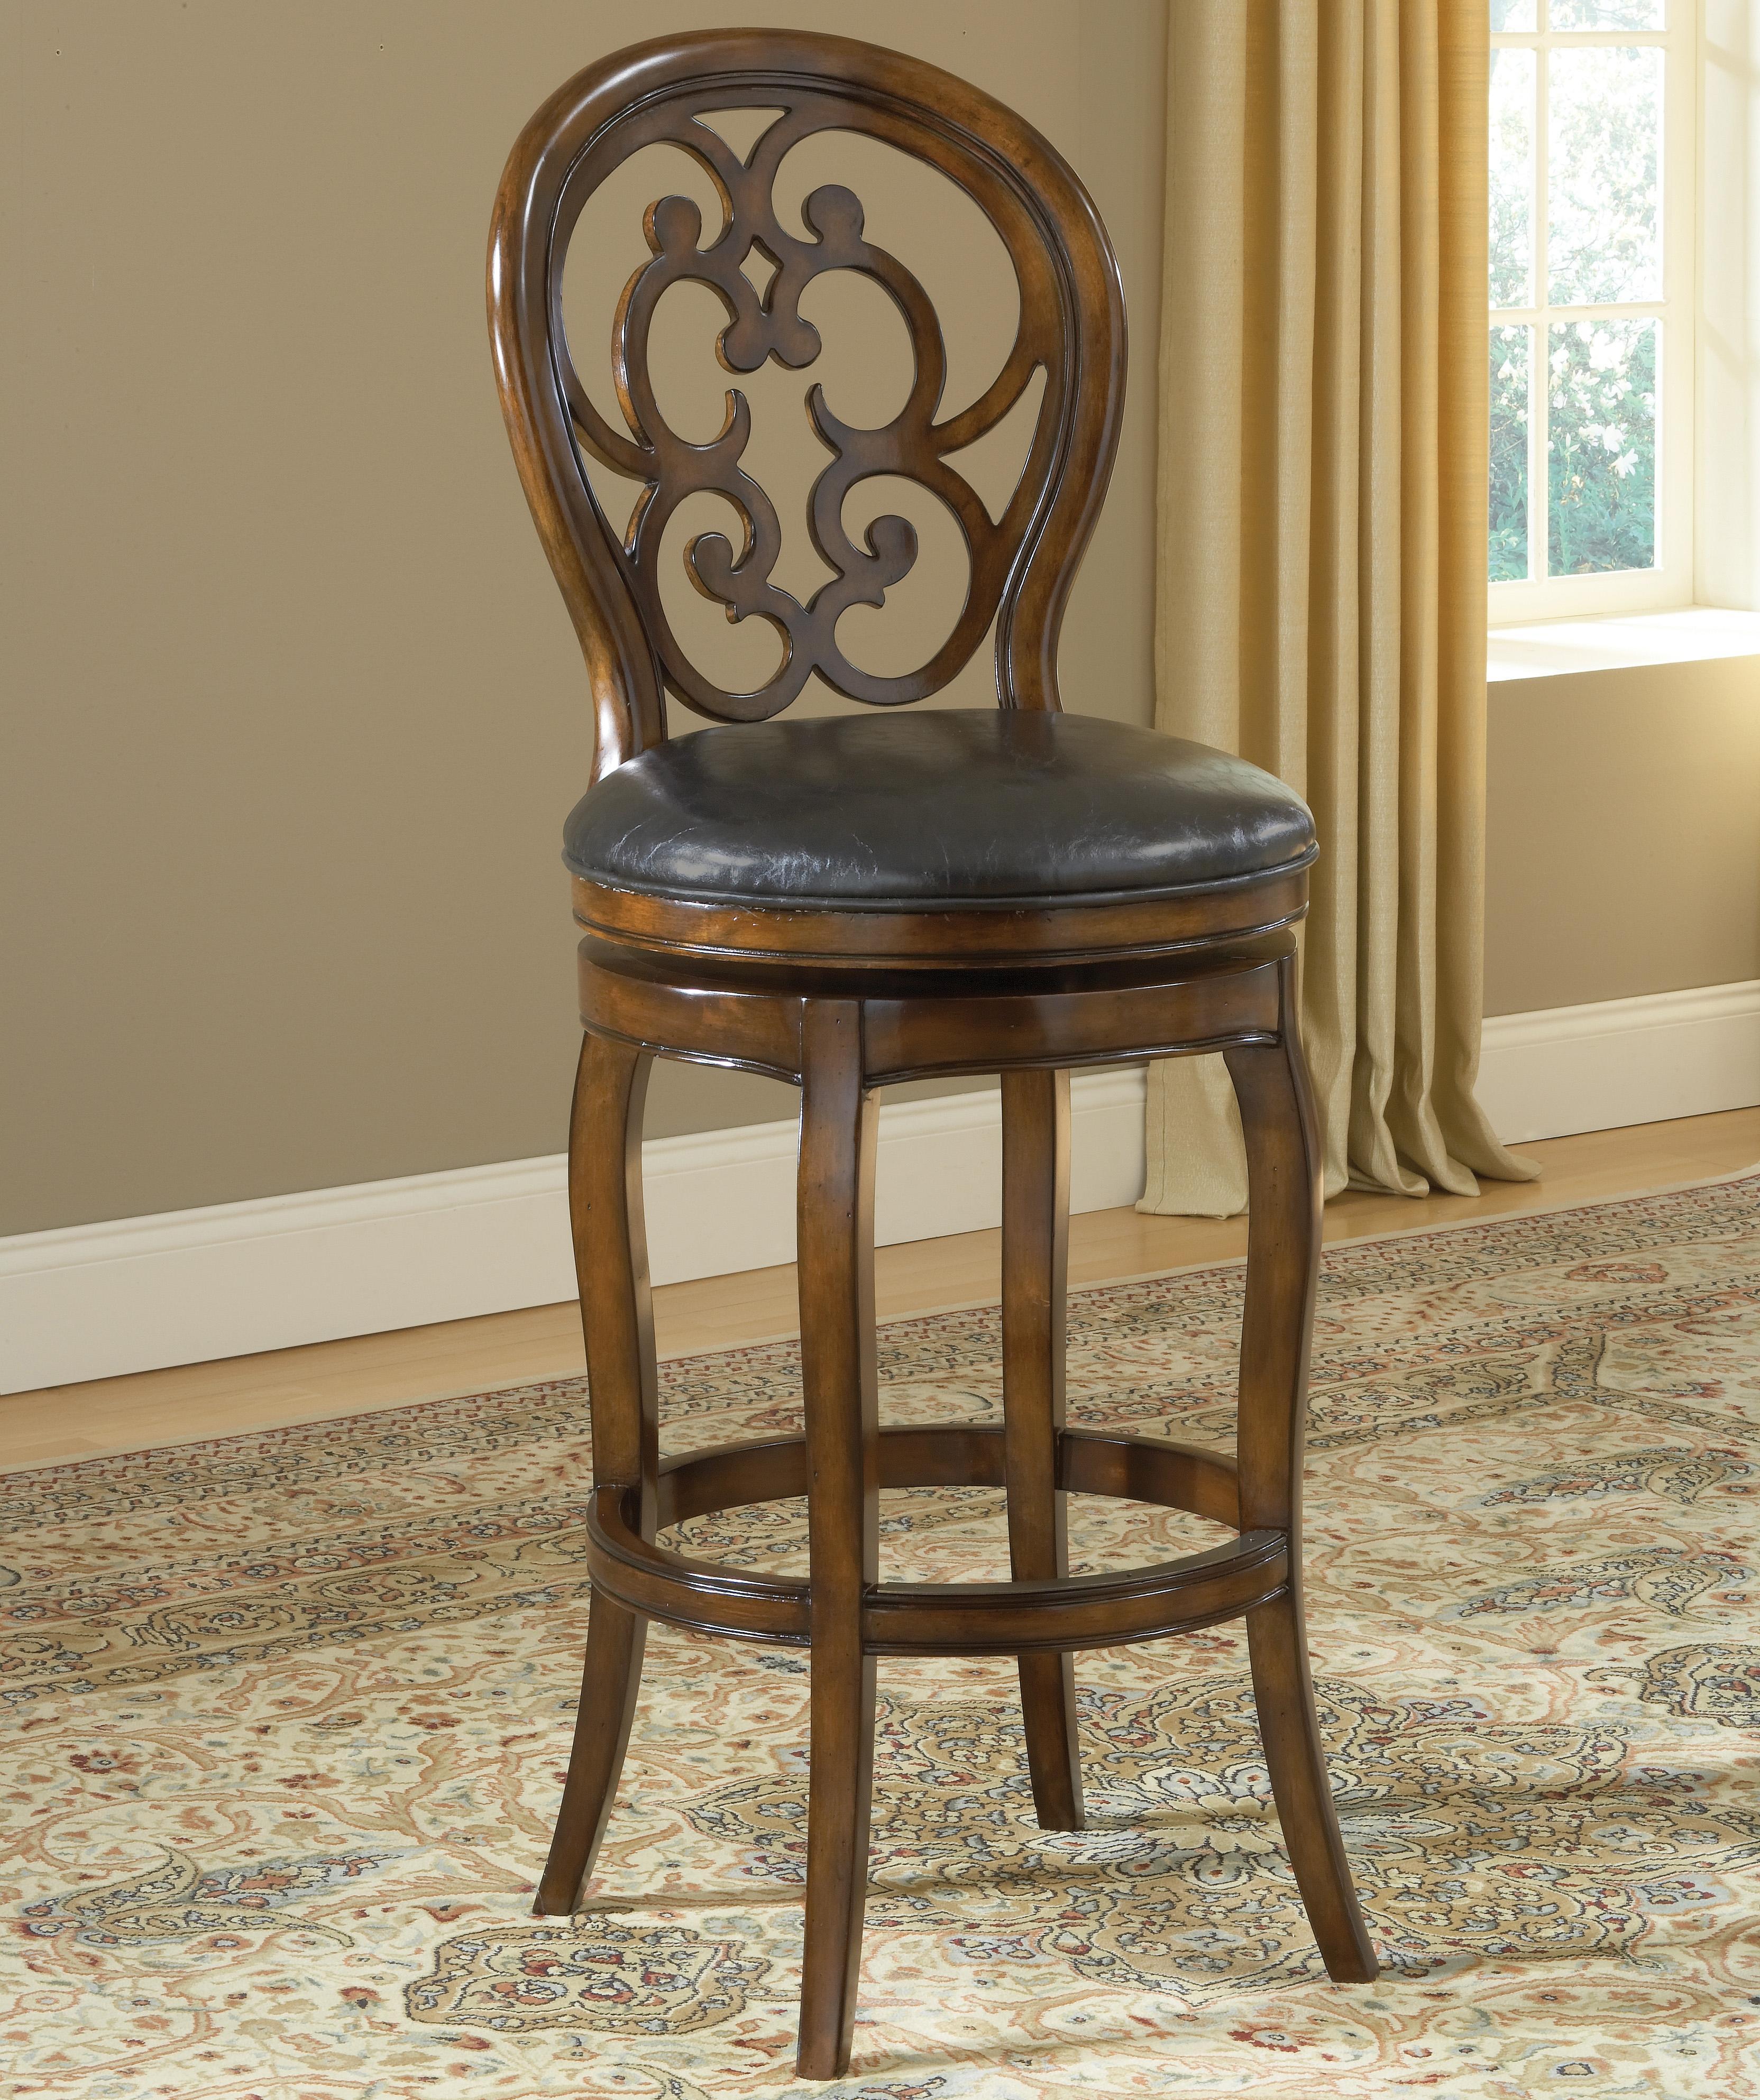 alexandra furniture. Alexandra Furniture. Swivel Bar Stool Furniture D